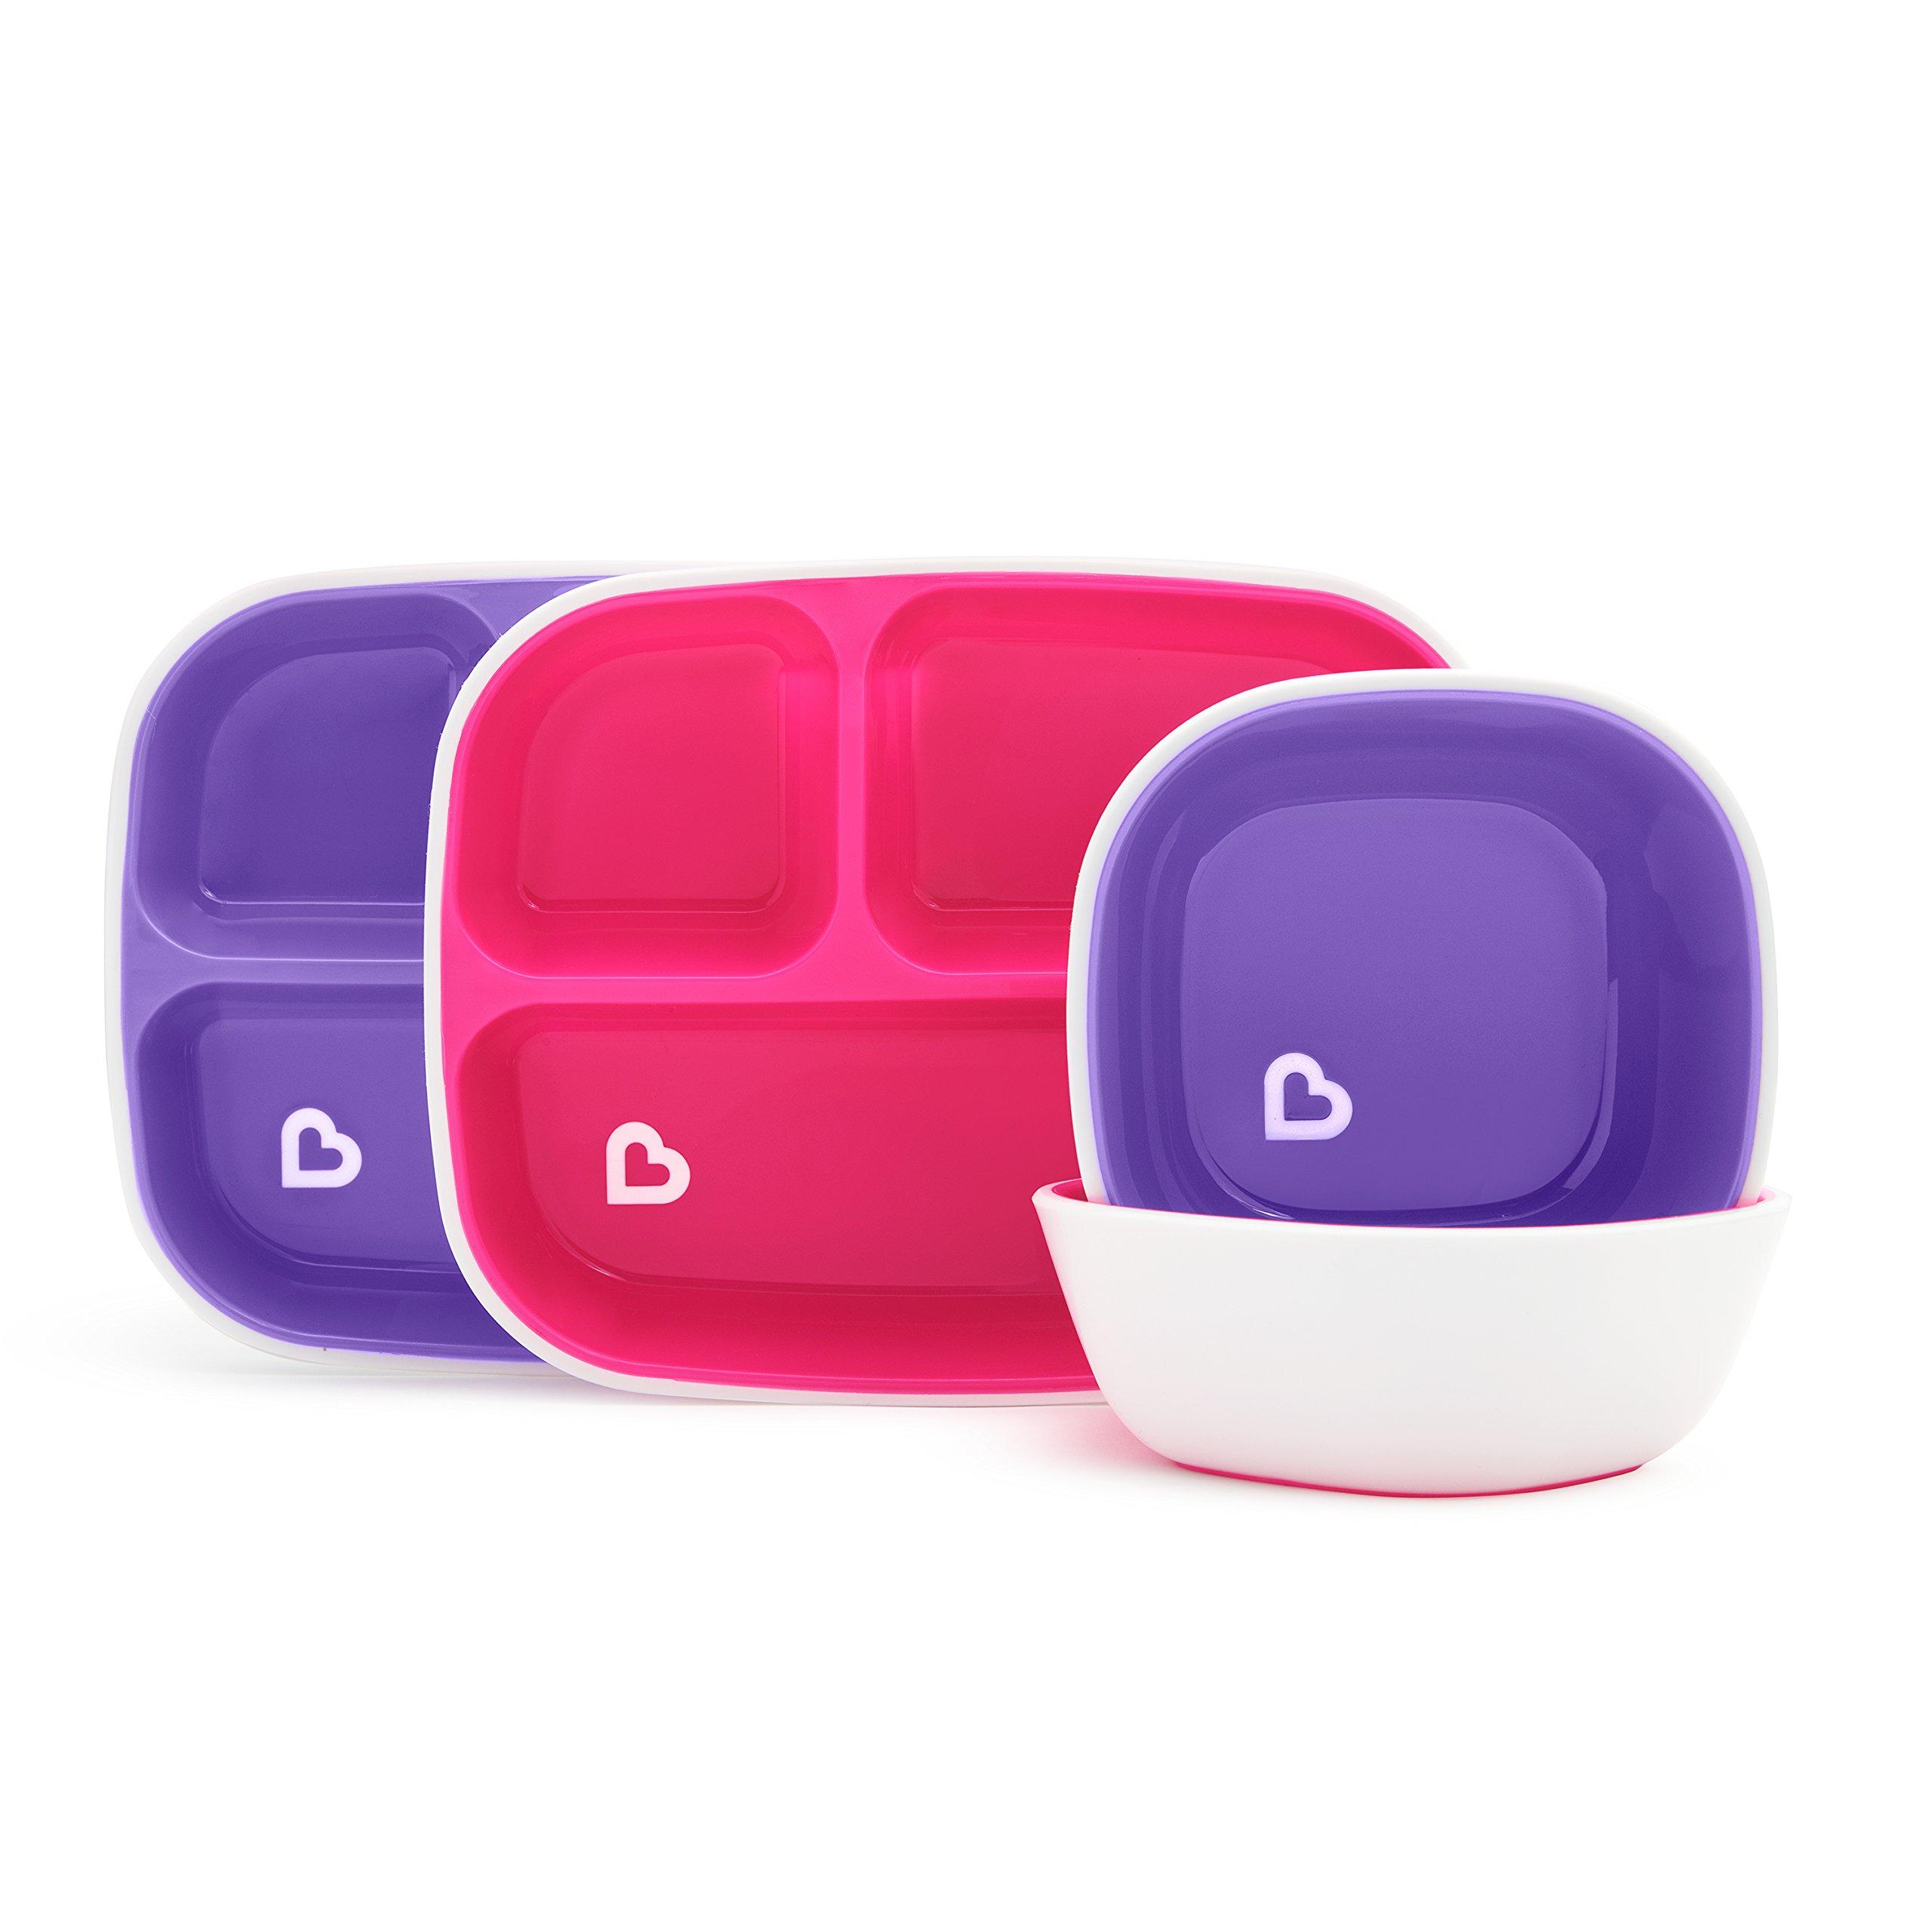 Munchkin Splash 4 Piece Toddler Divided Plate and Bowl Dining Set, Pink/Purple